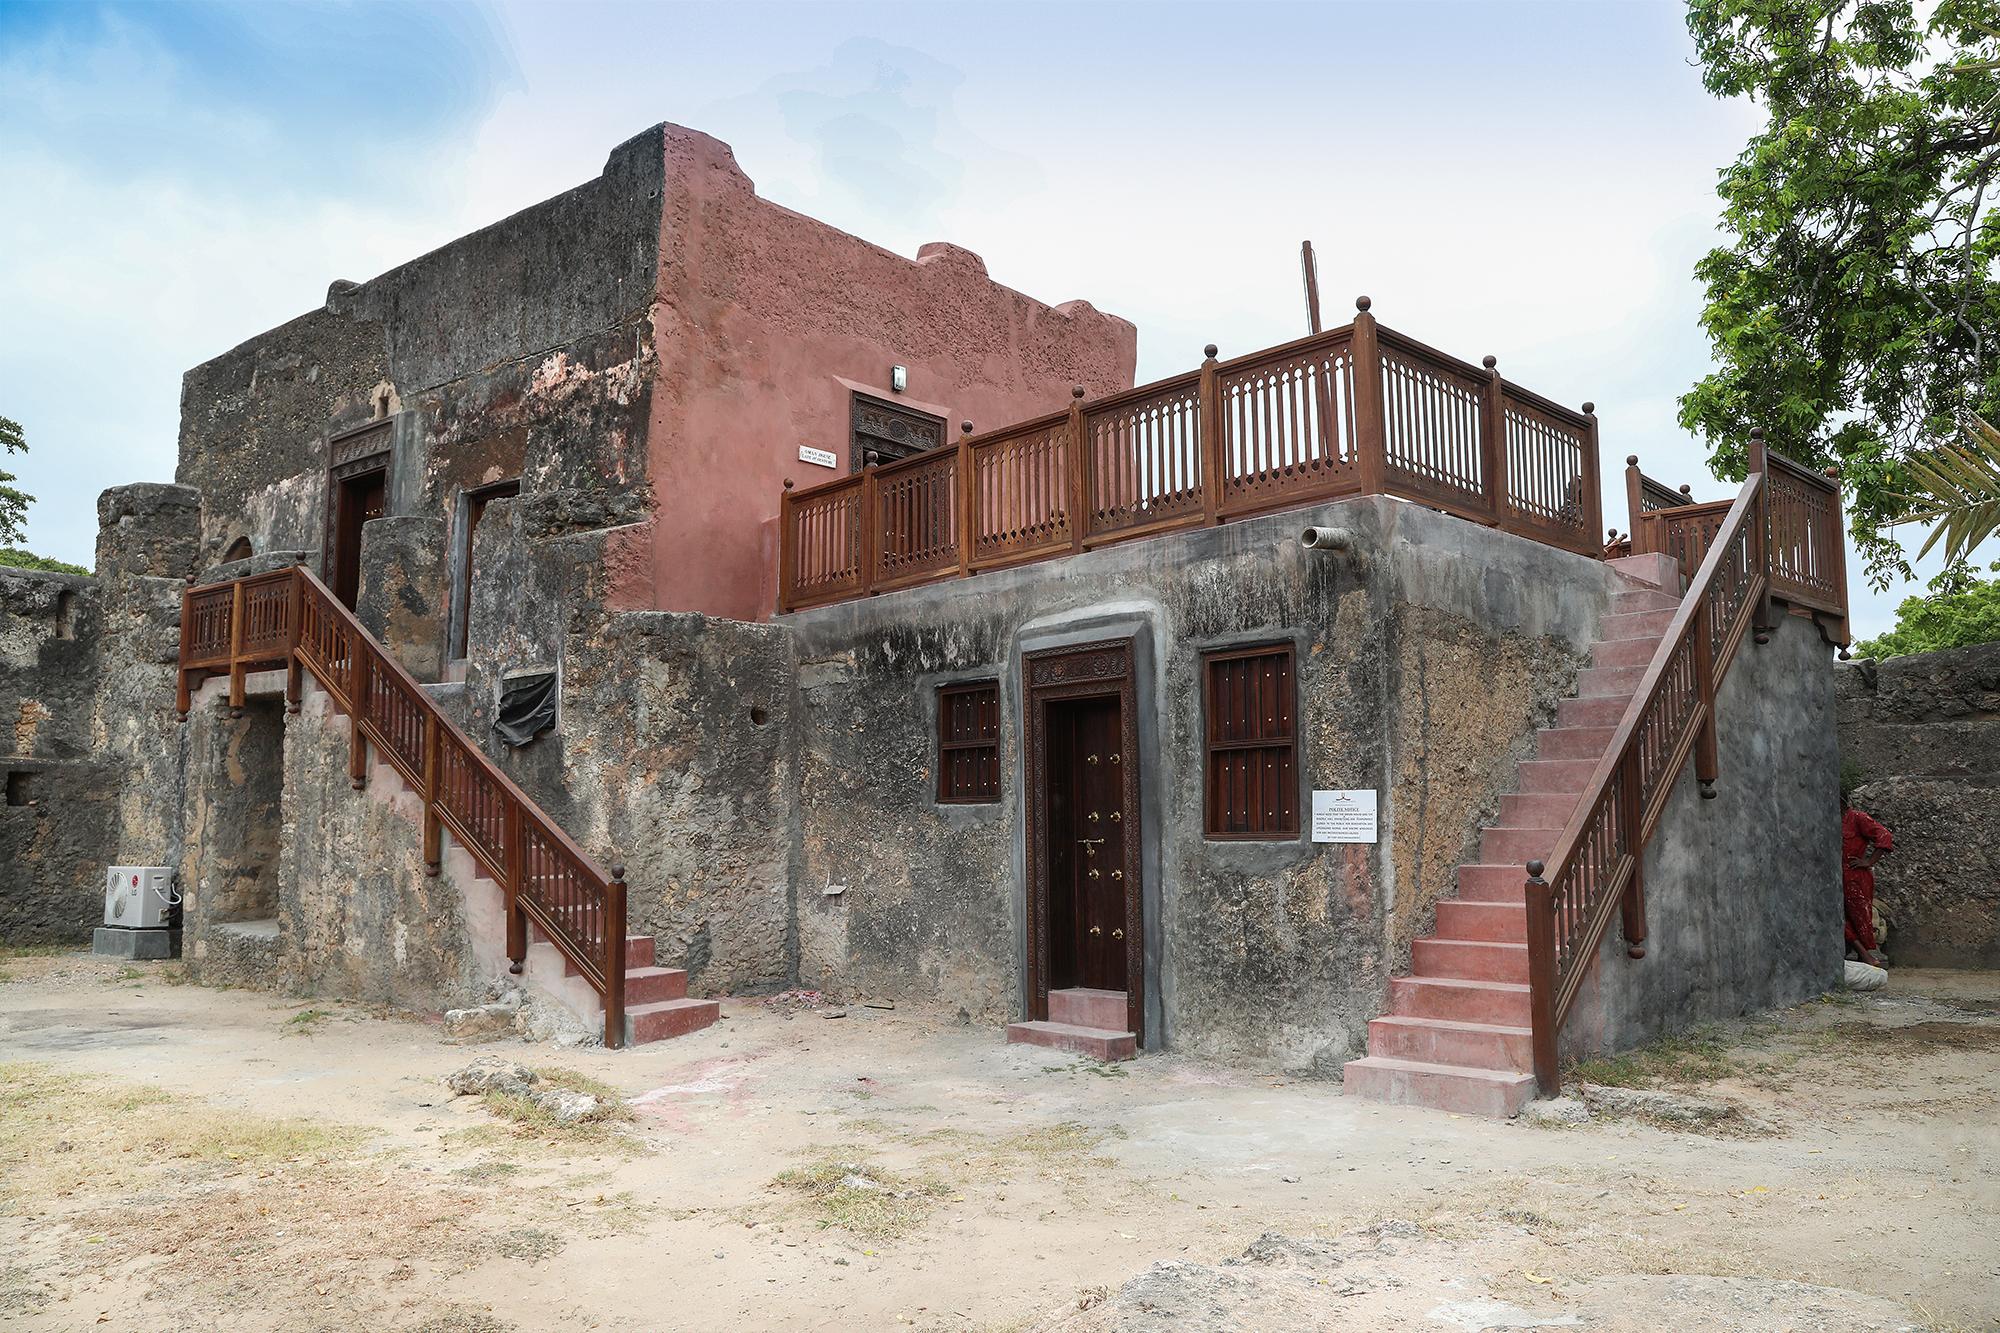 Photo of معرض متحفي دائم للسلطنة في قلعة ممباسا وتحديد موعد افتتاحه